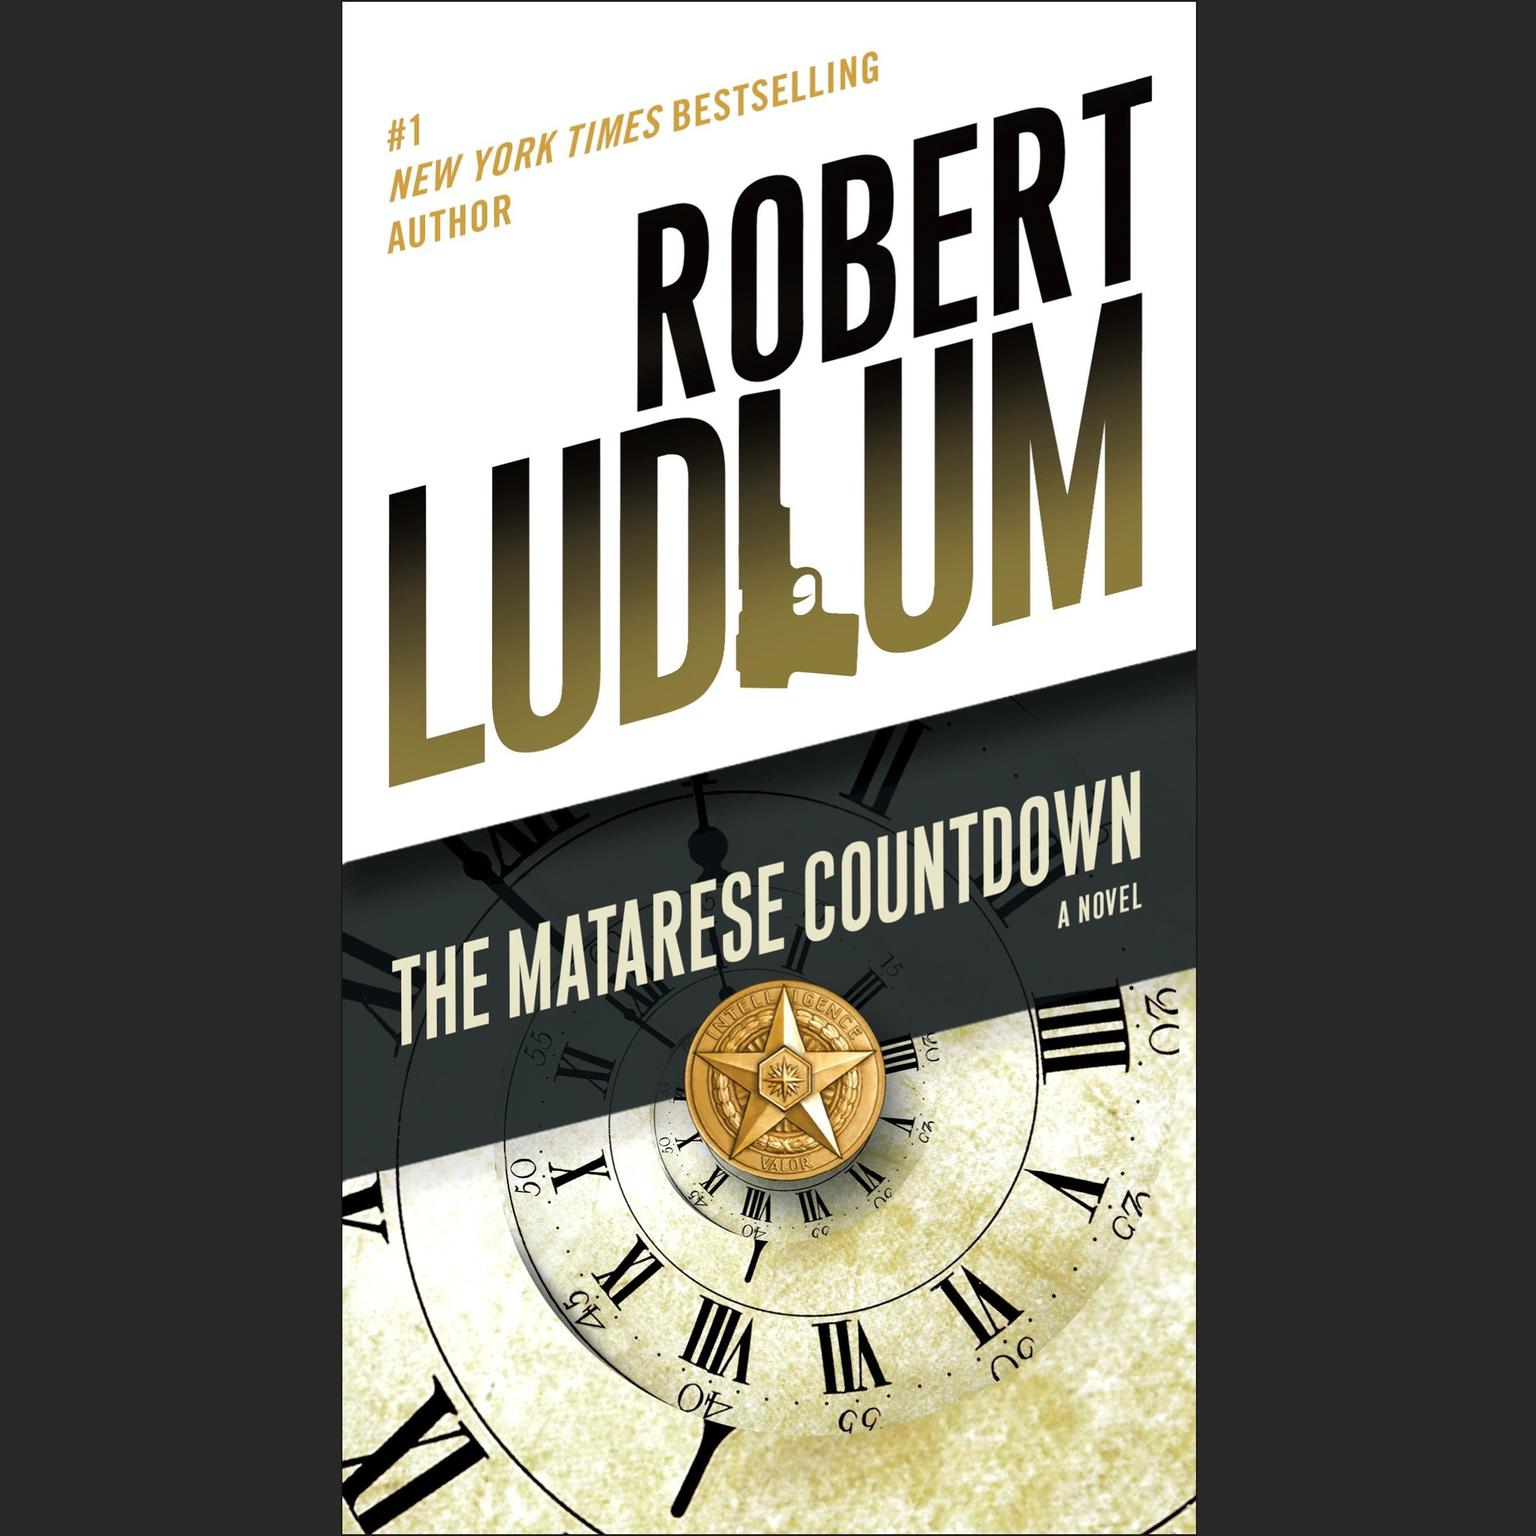 The Matarese Countdown (Abridged) Audiobook, by Robert Ludlum